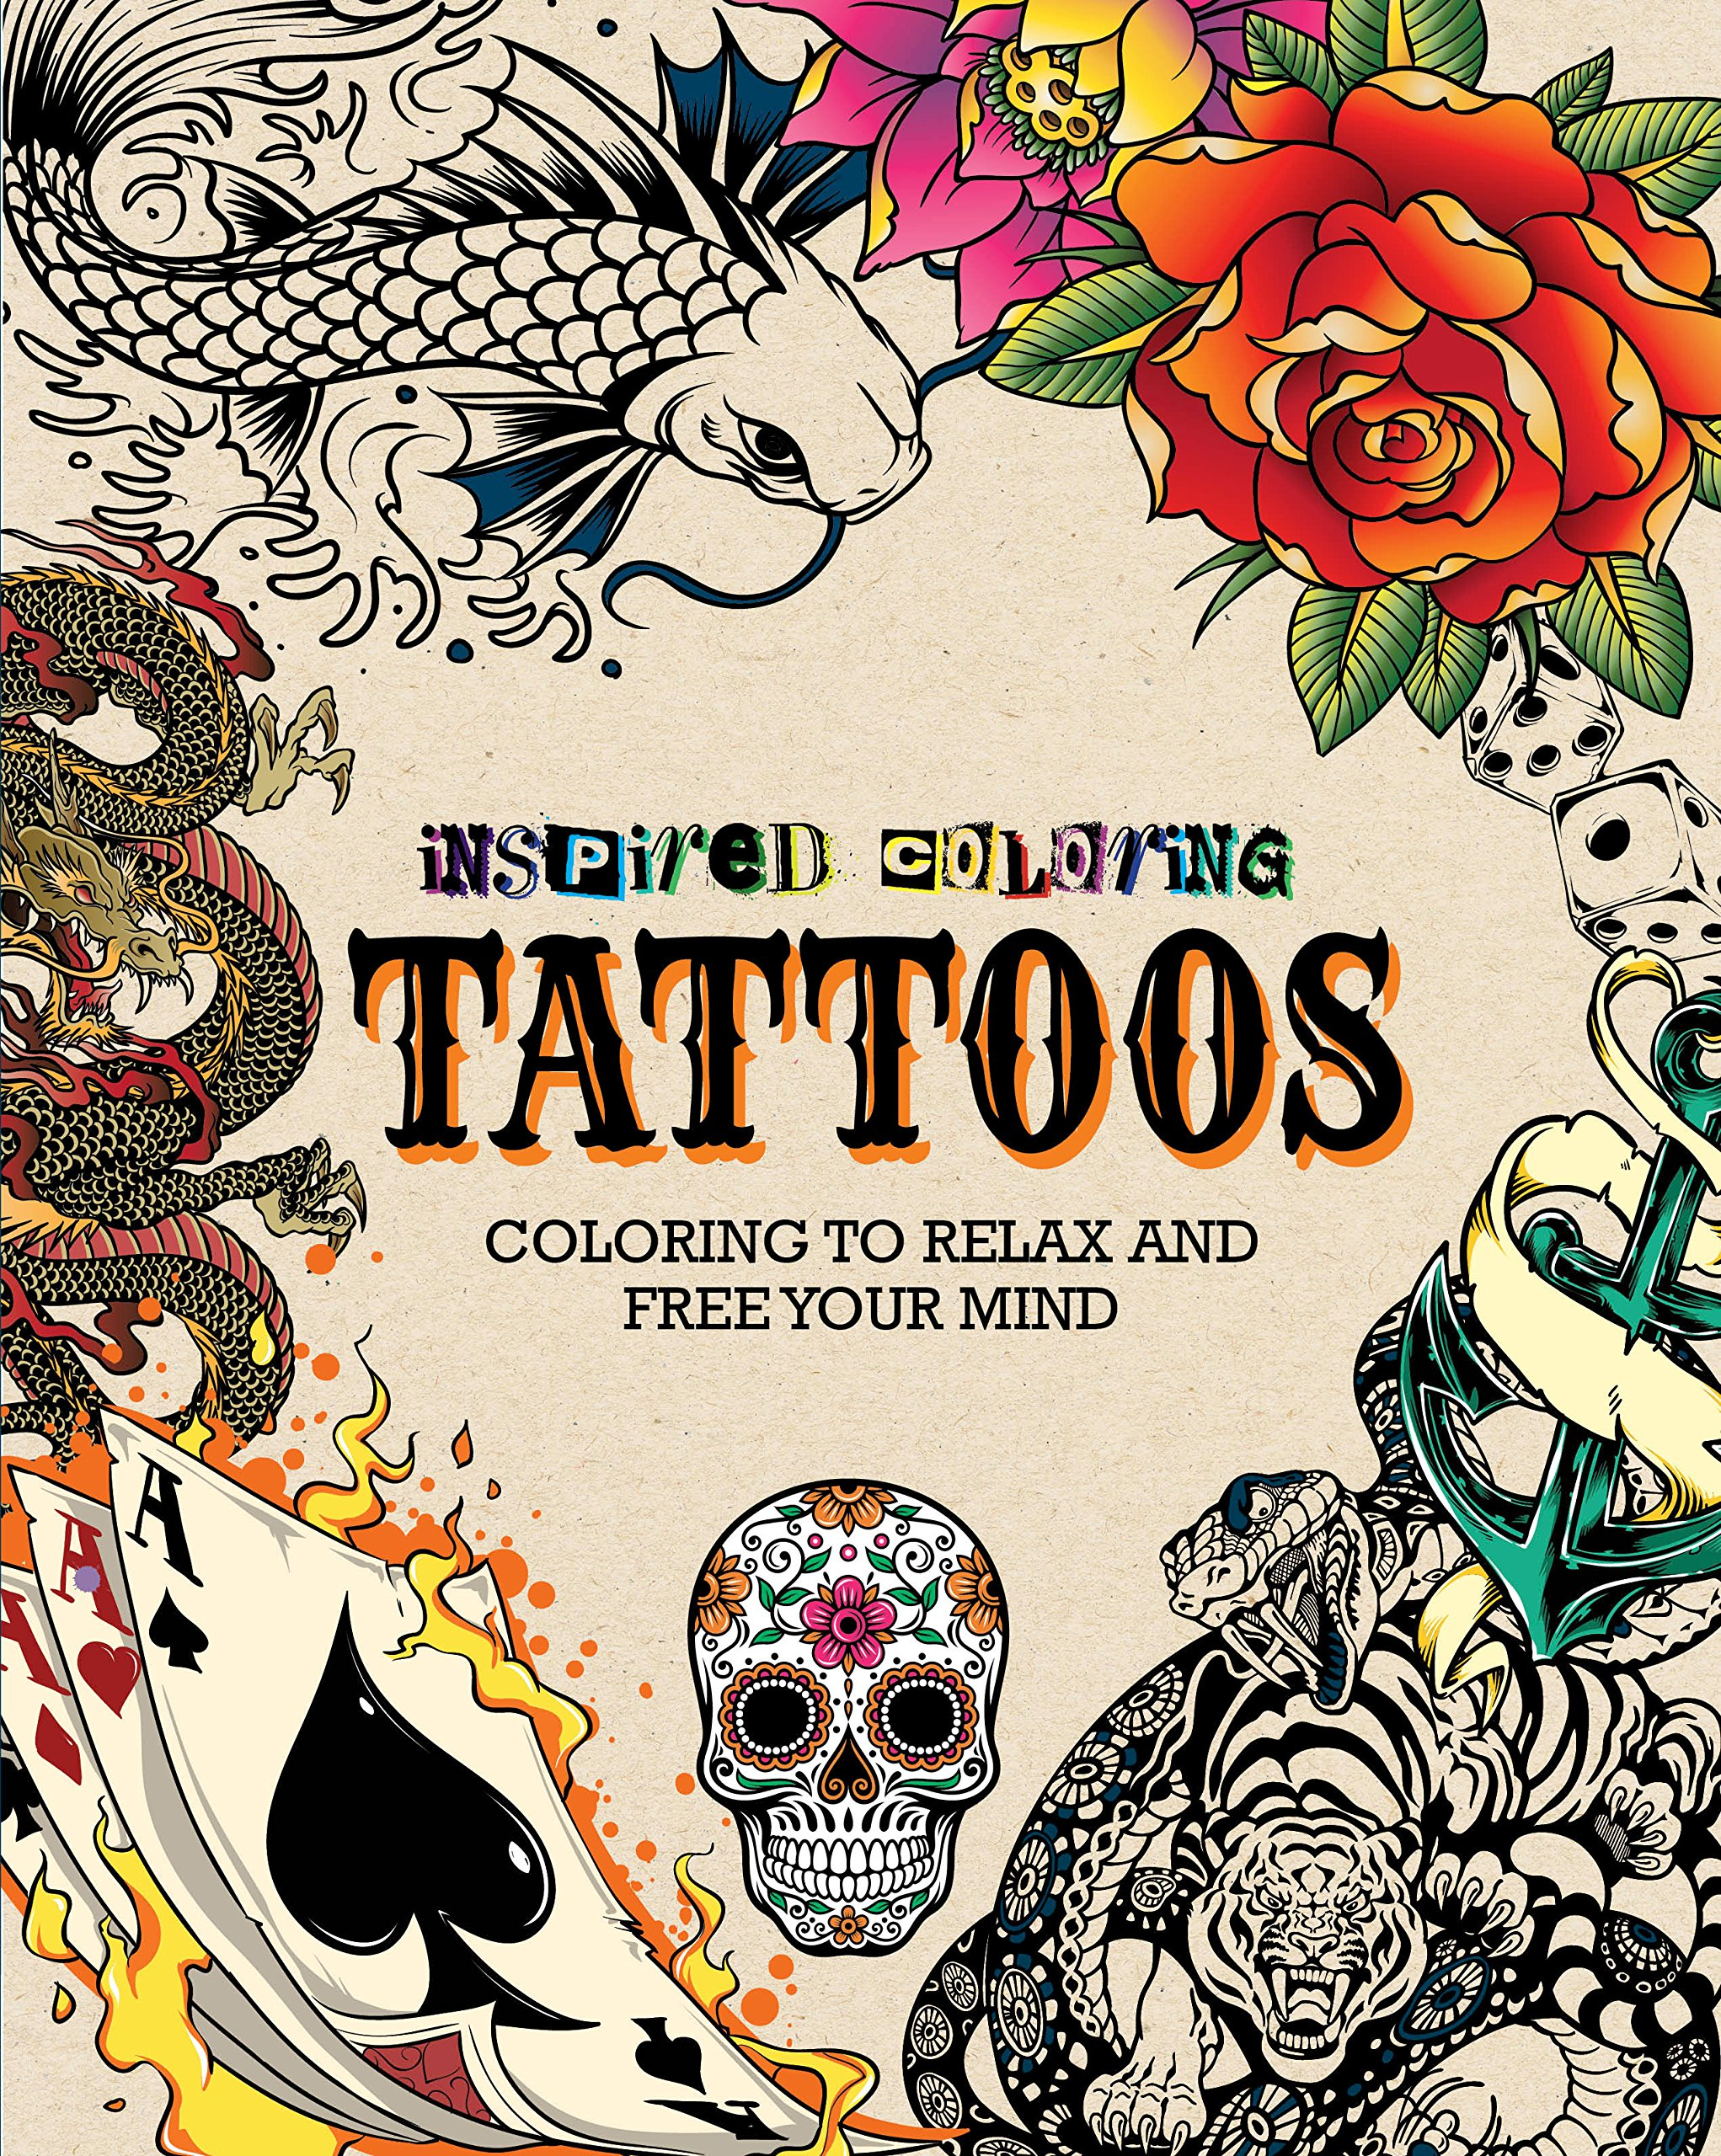 Critique du livre inspired colouring Tattoo collection Parragon